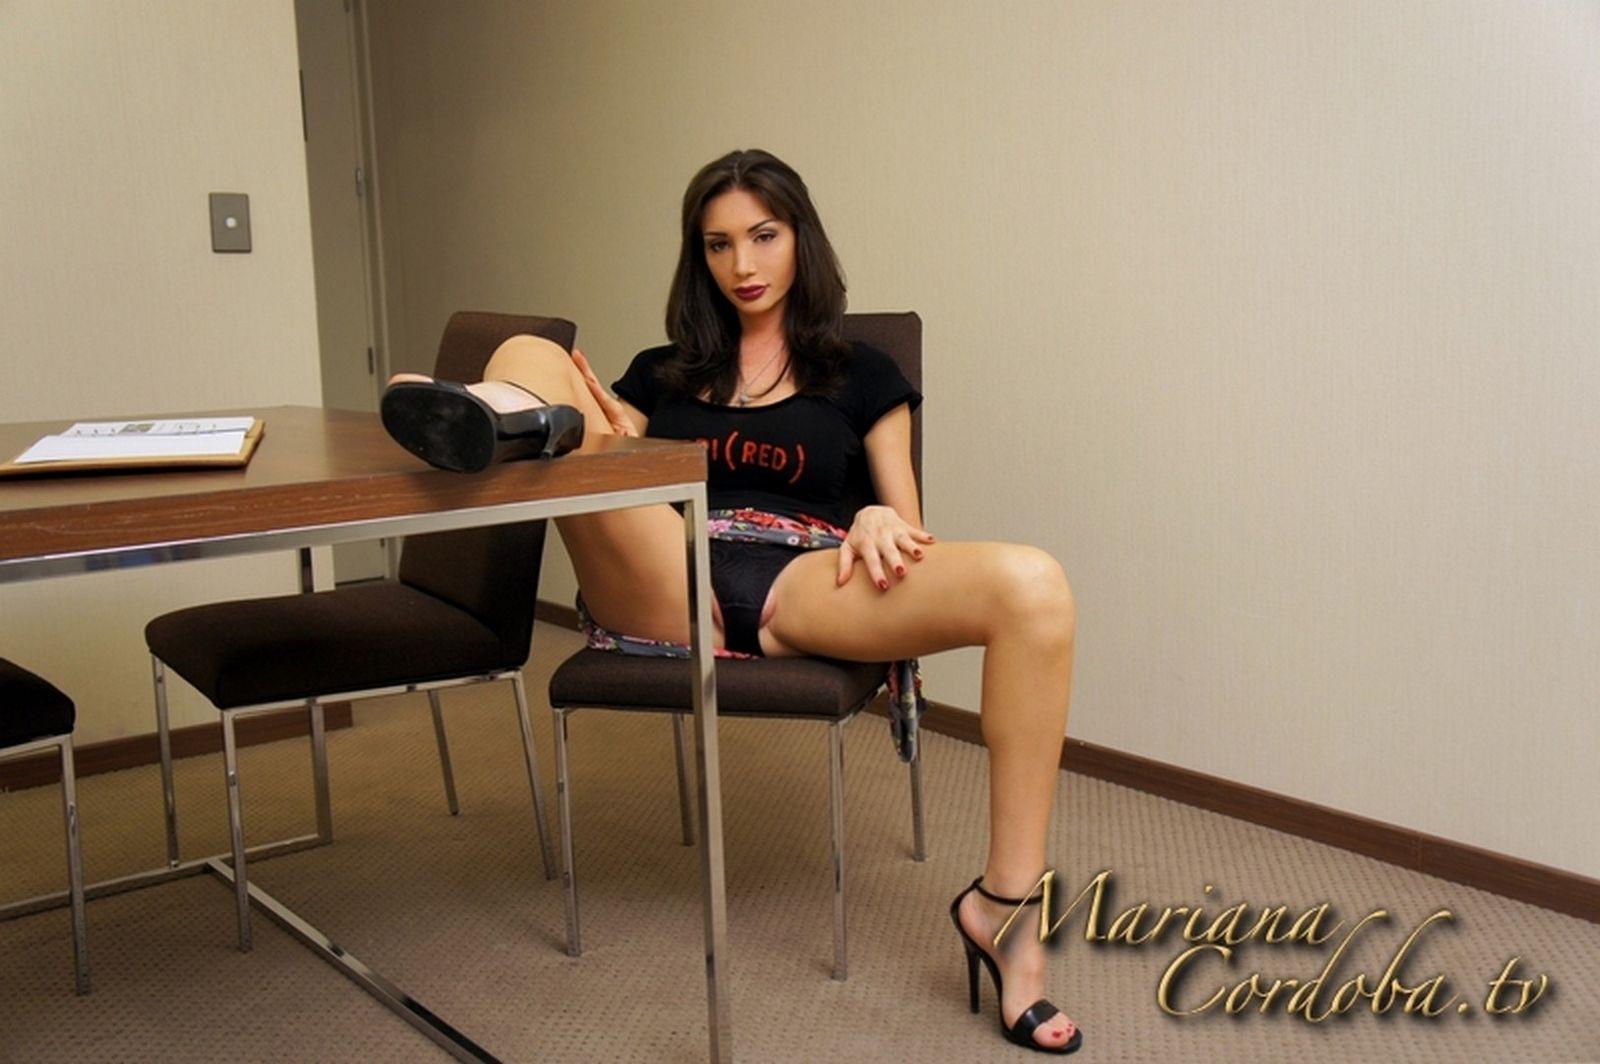 Похотливая Мариана Кордоба на работе